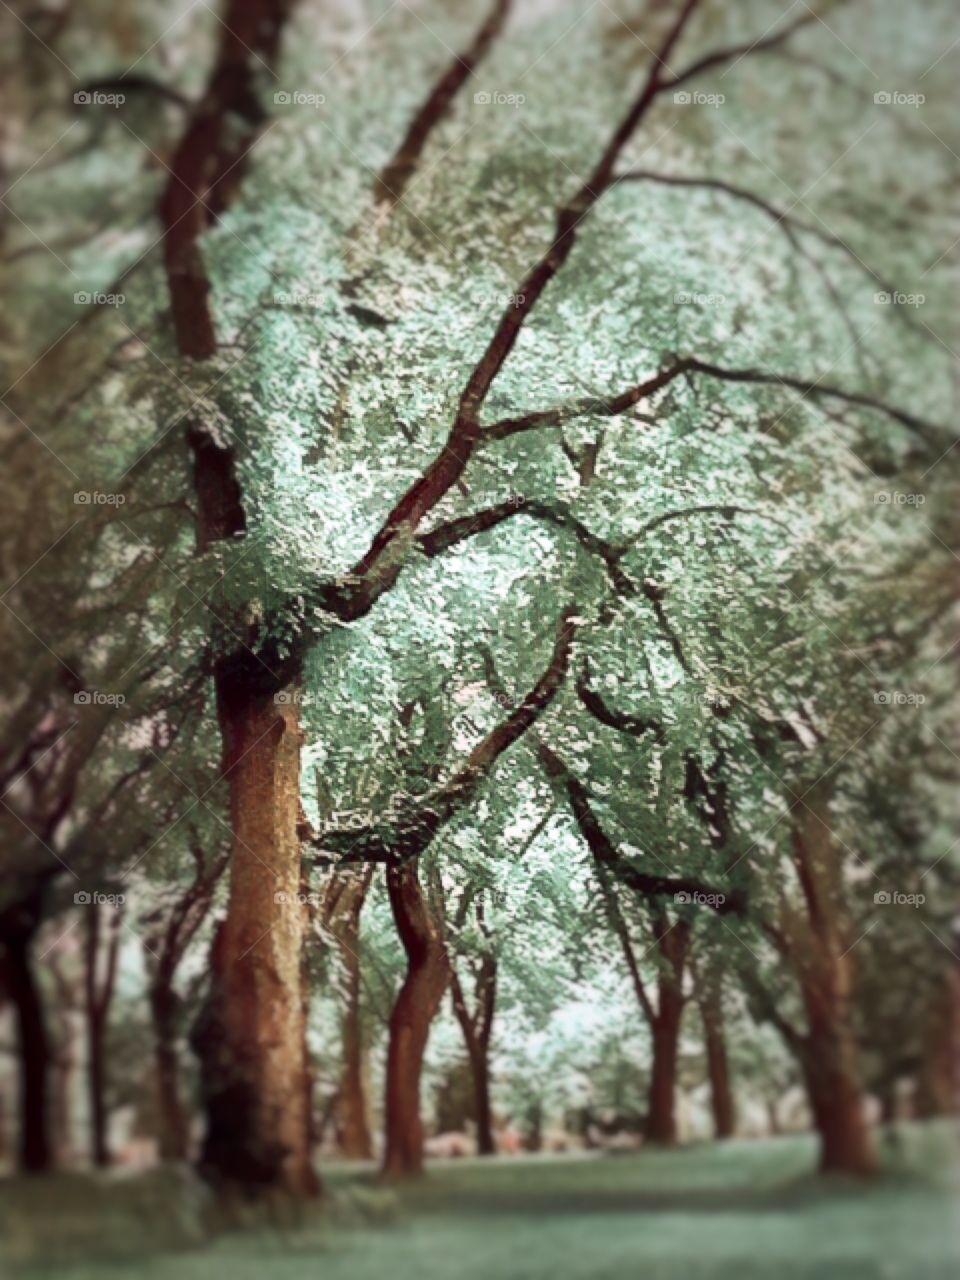 American Elm Trees - Central Park, New York City.